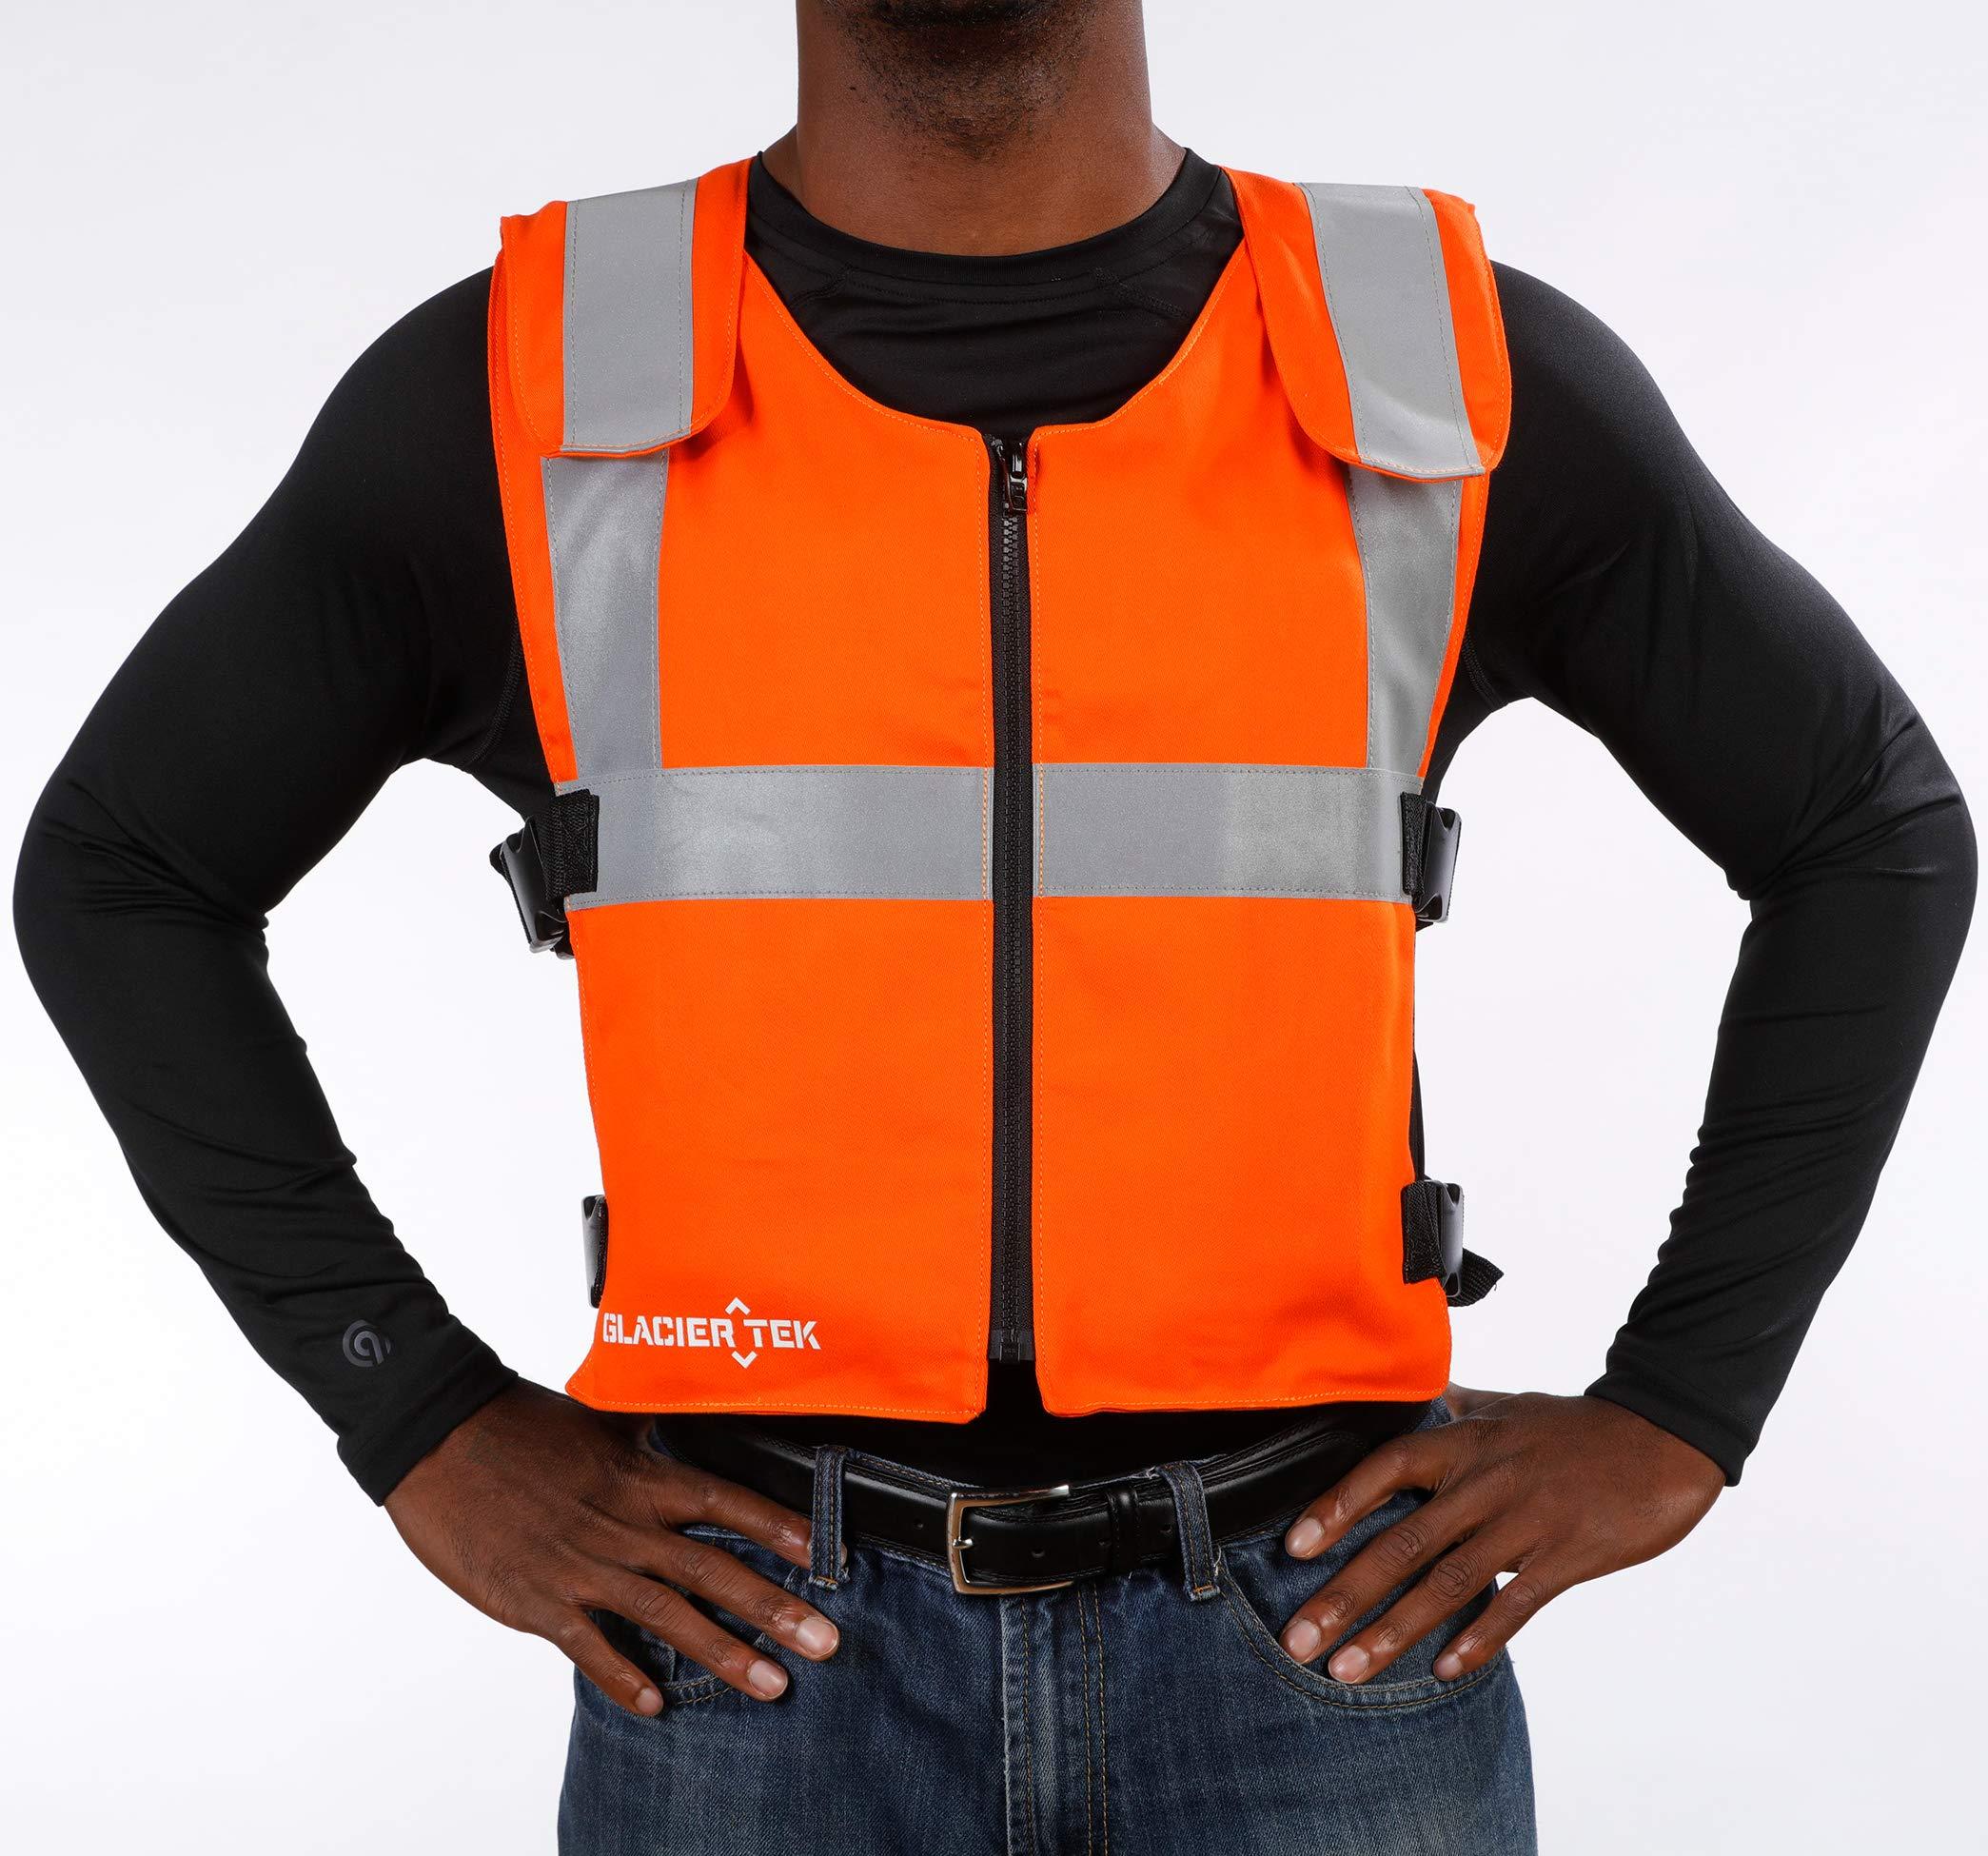 Glacier Tek Original Cool Vest with FR3 Flame-Retardant Banox Fabric and Nontoxic Cooling Packs Orange